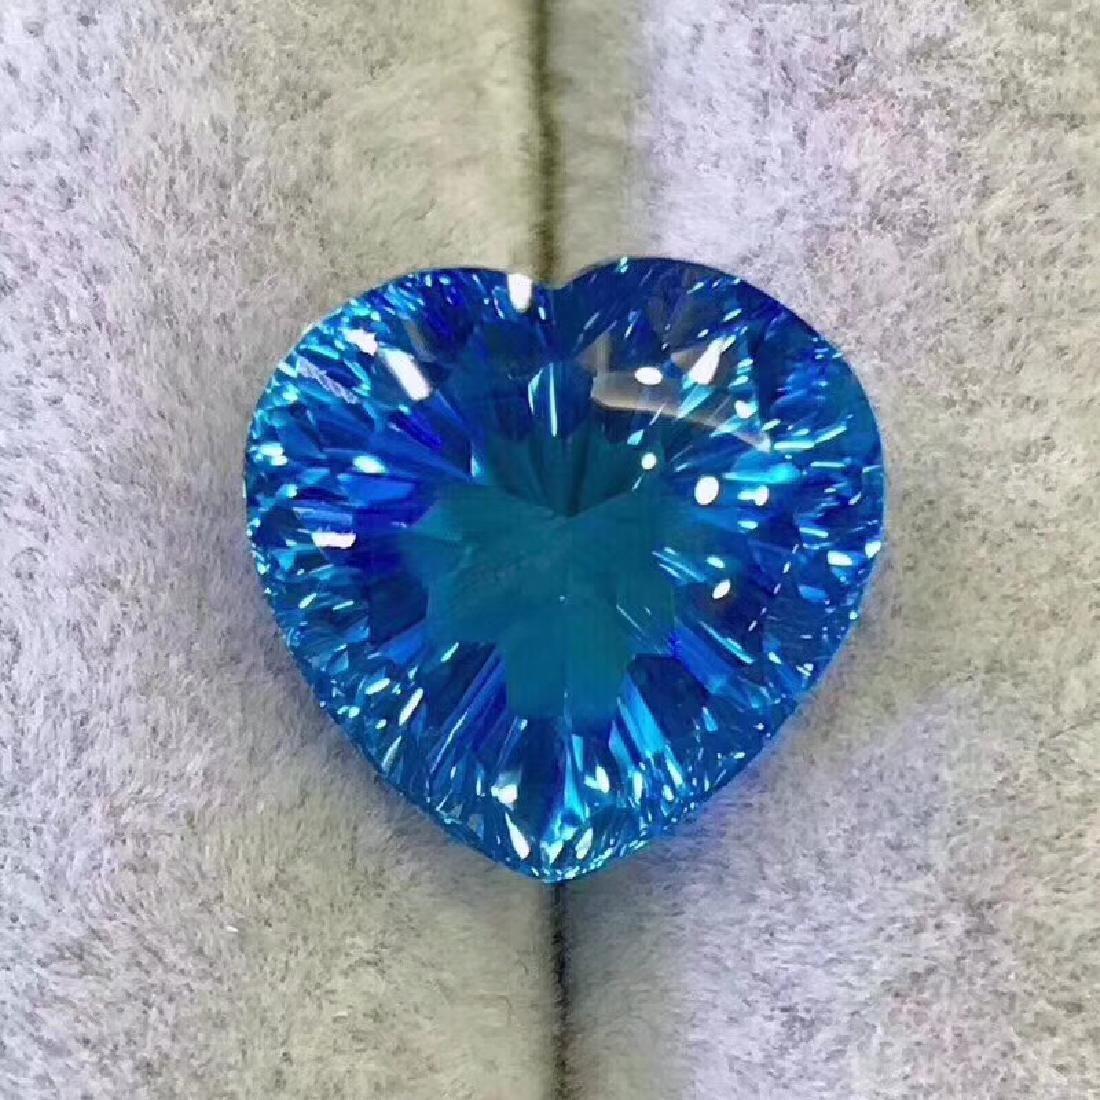 24.8 ct Topaz 17.0*16.5 mm Heart Cut